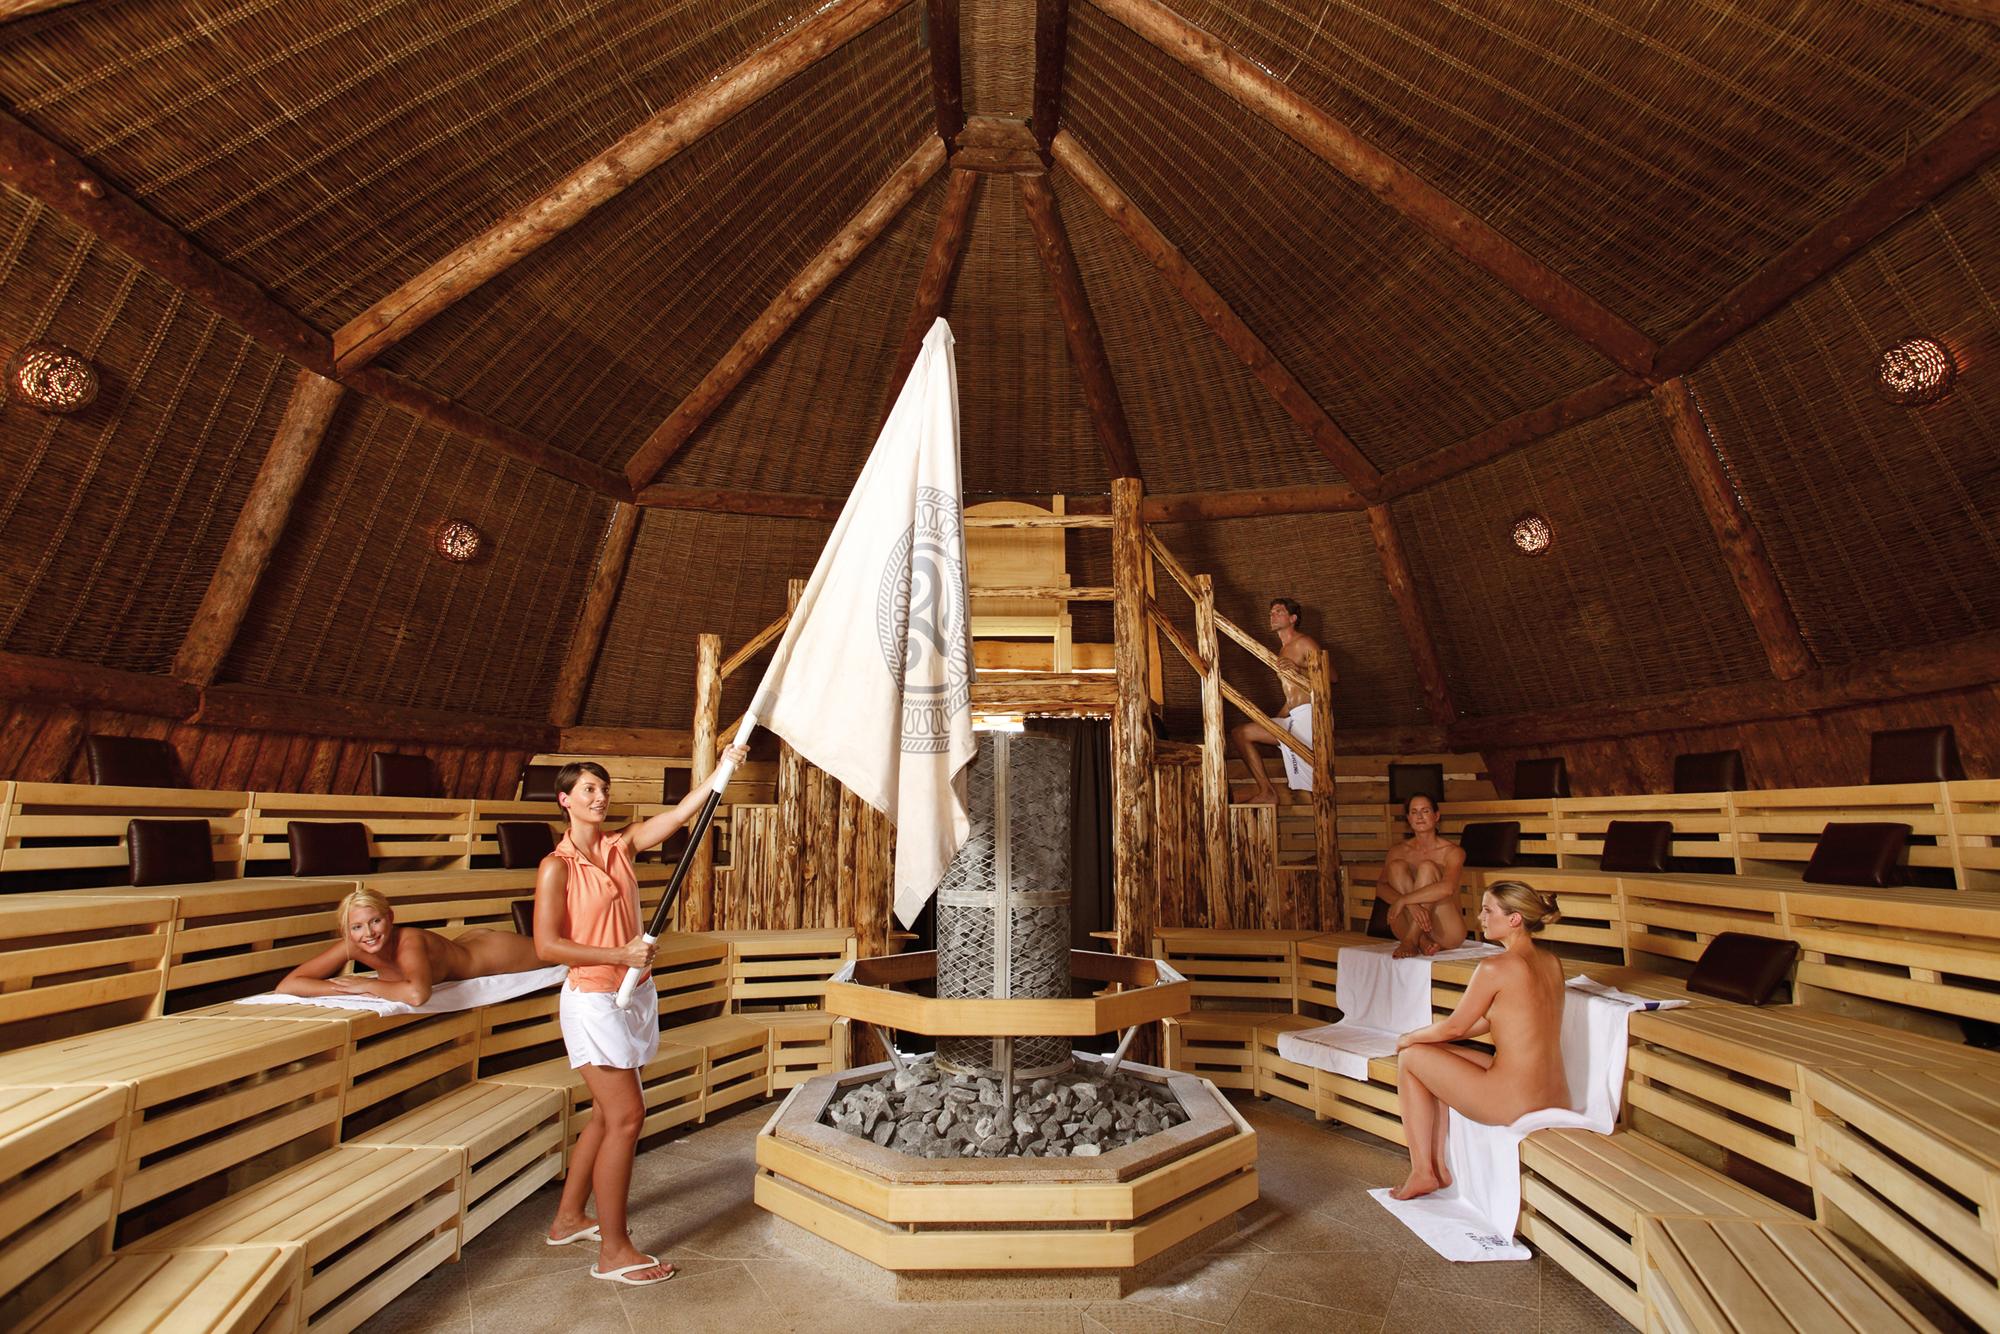 Sauna Culture in Europe Over the Holidays | Ben Casnocha